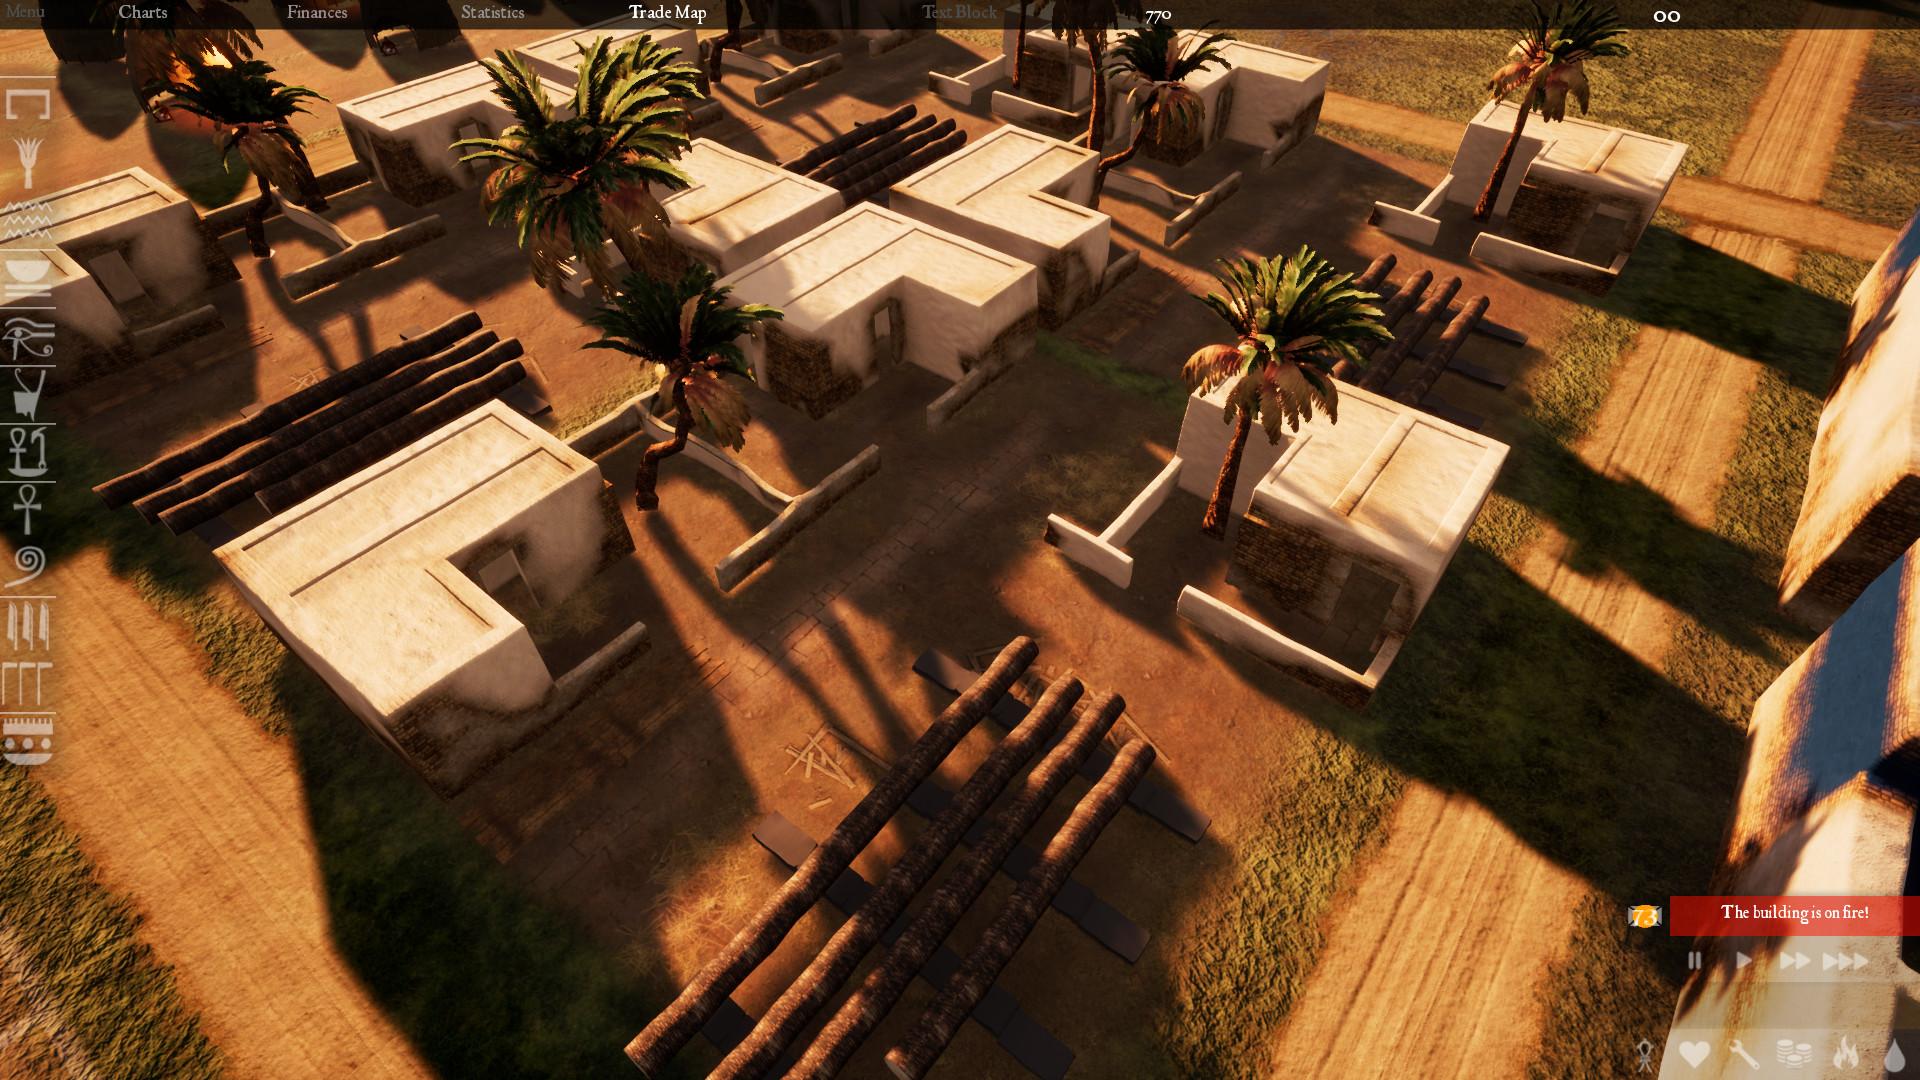 pharaoh game download portugues torrent